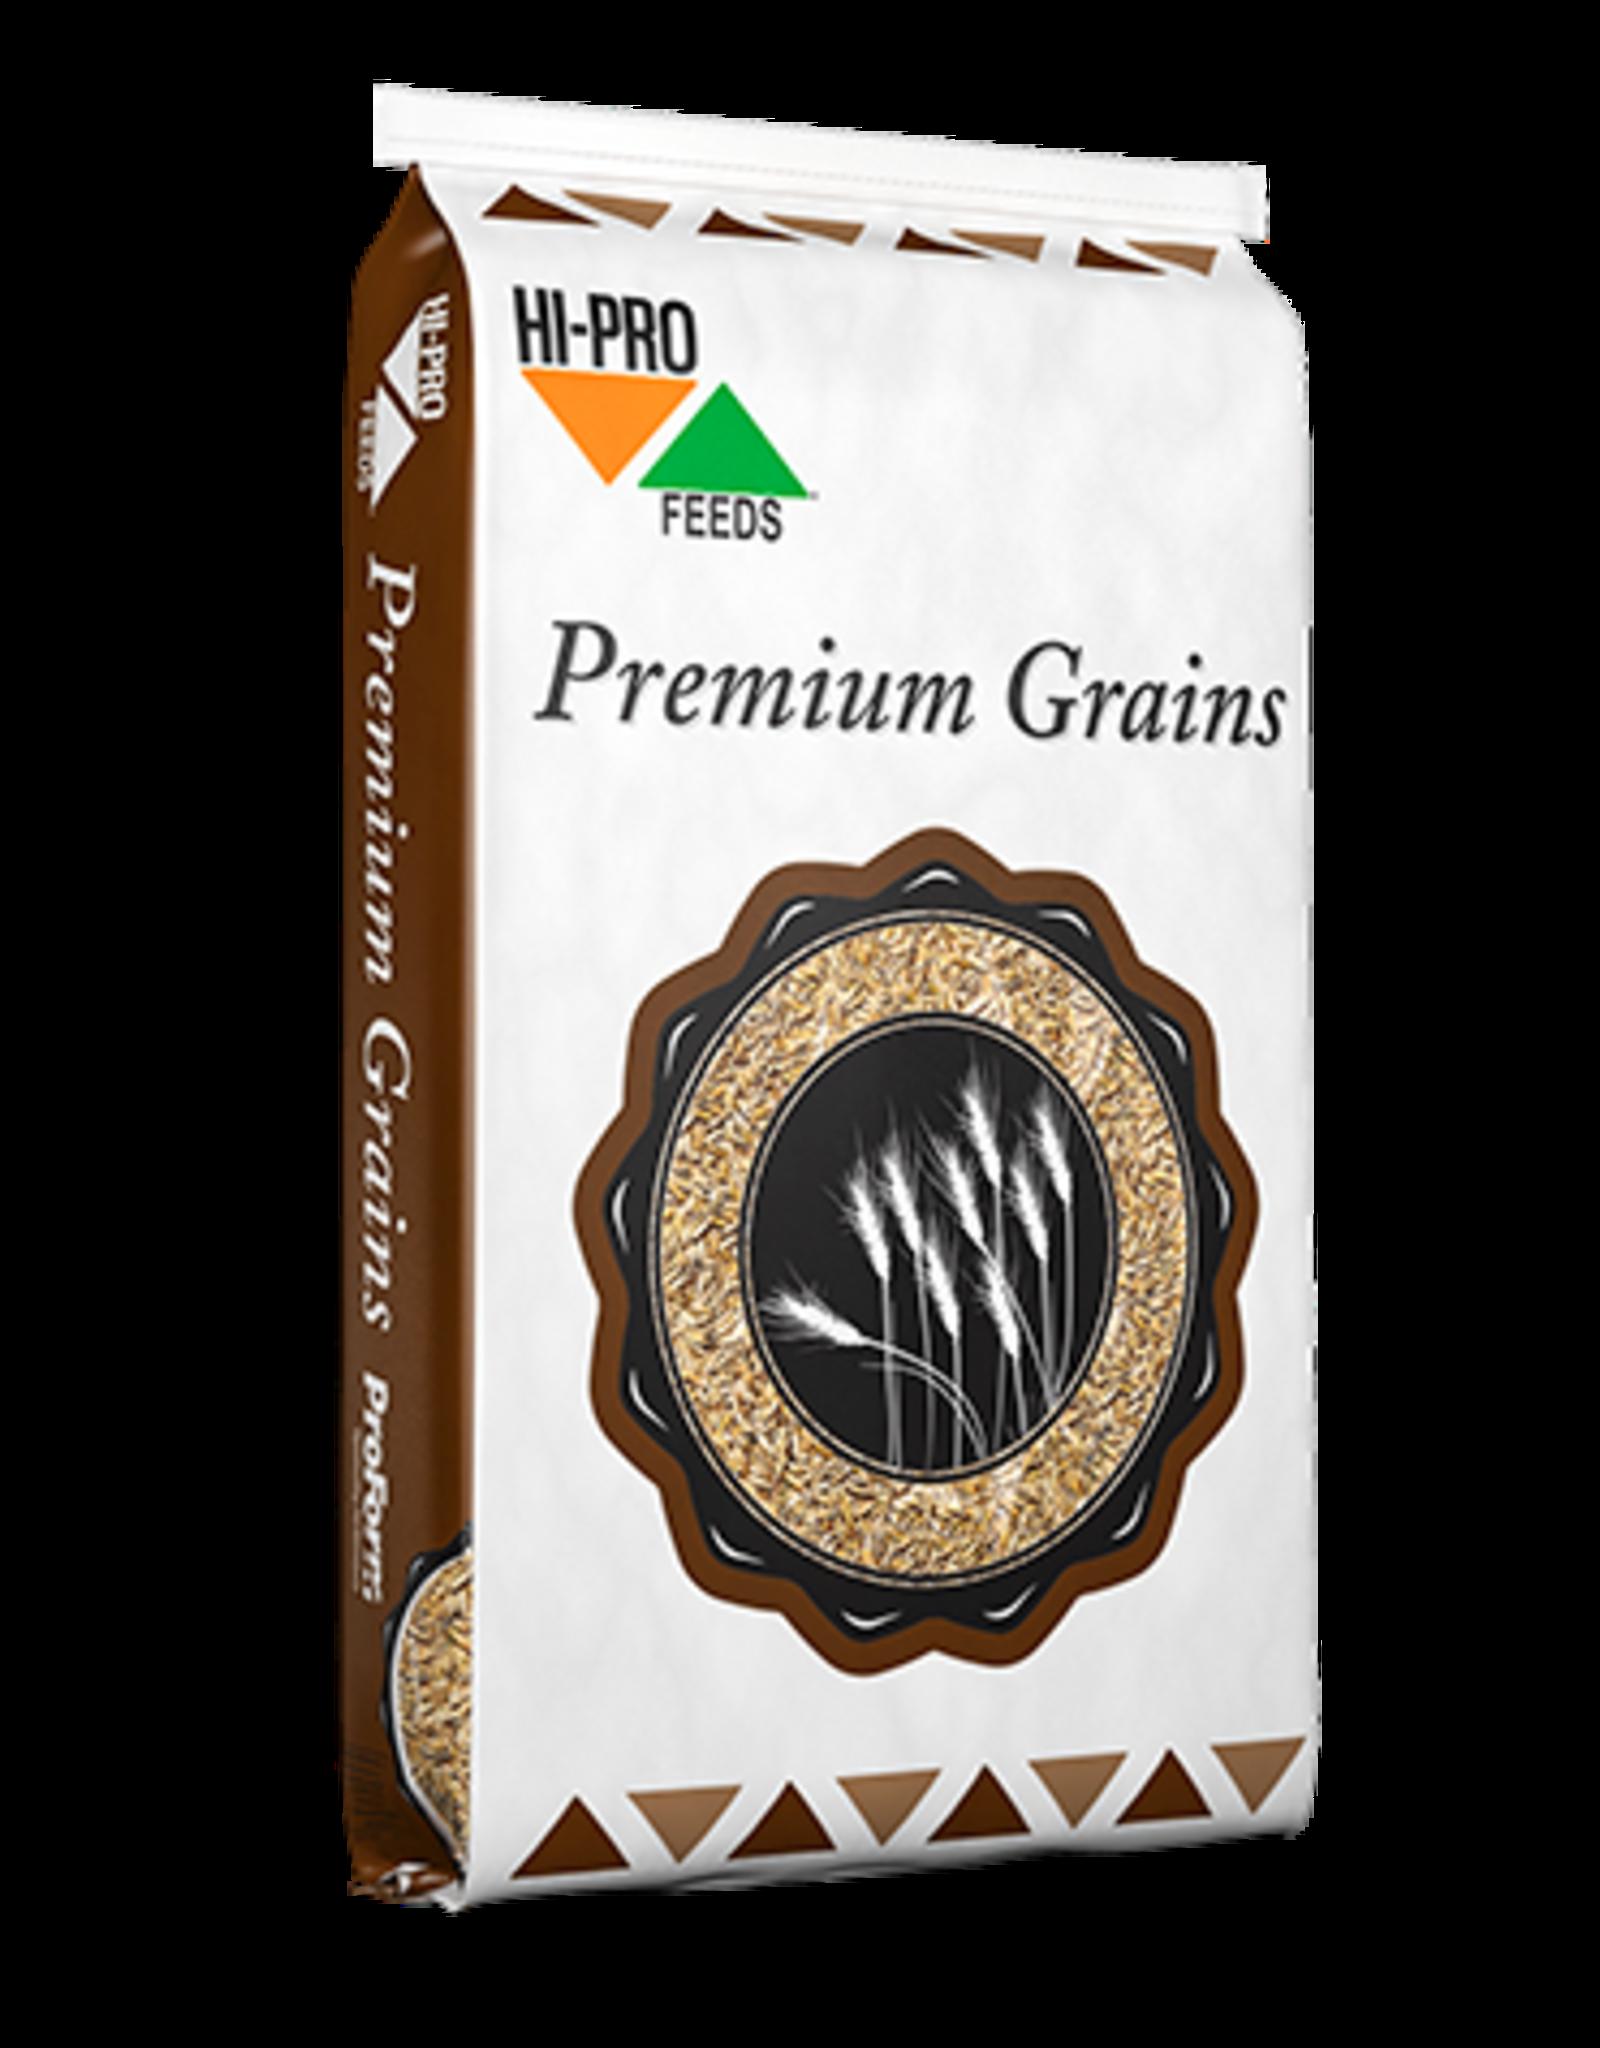 HiPro Feeds (Trouw) Black Oil Sunflower Seeds